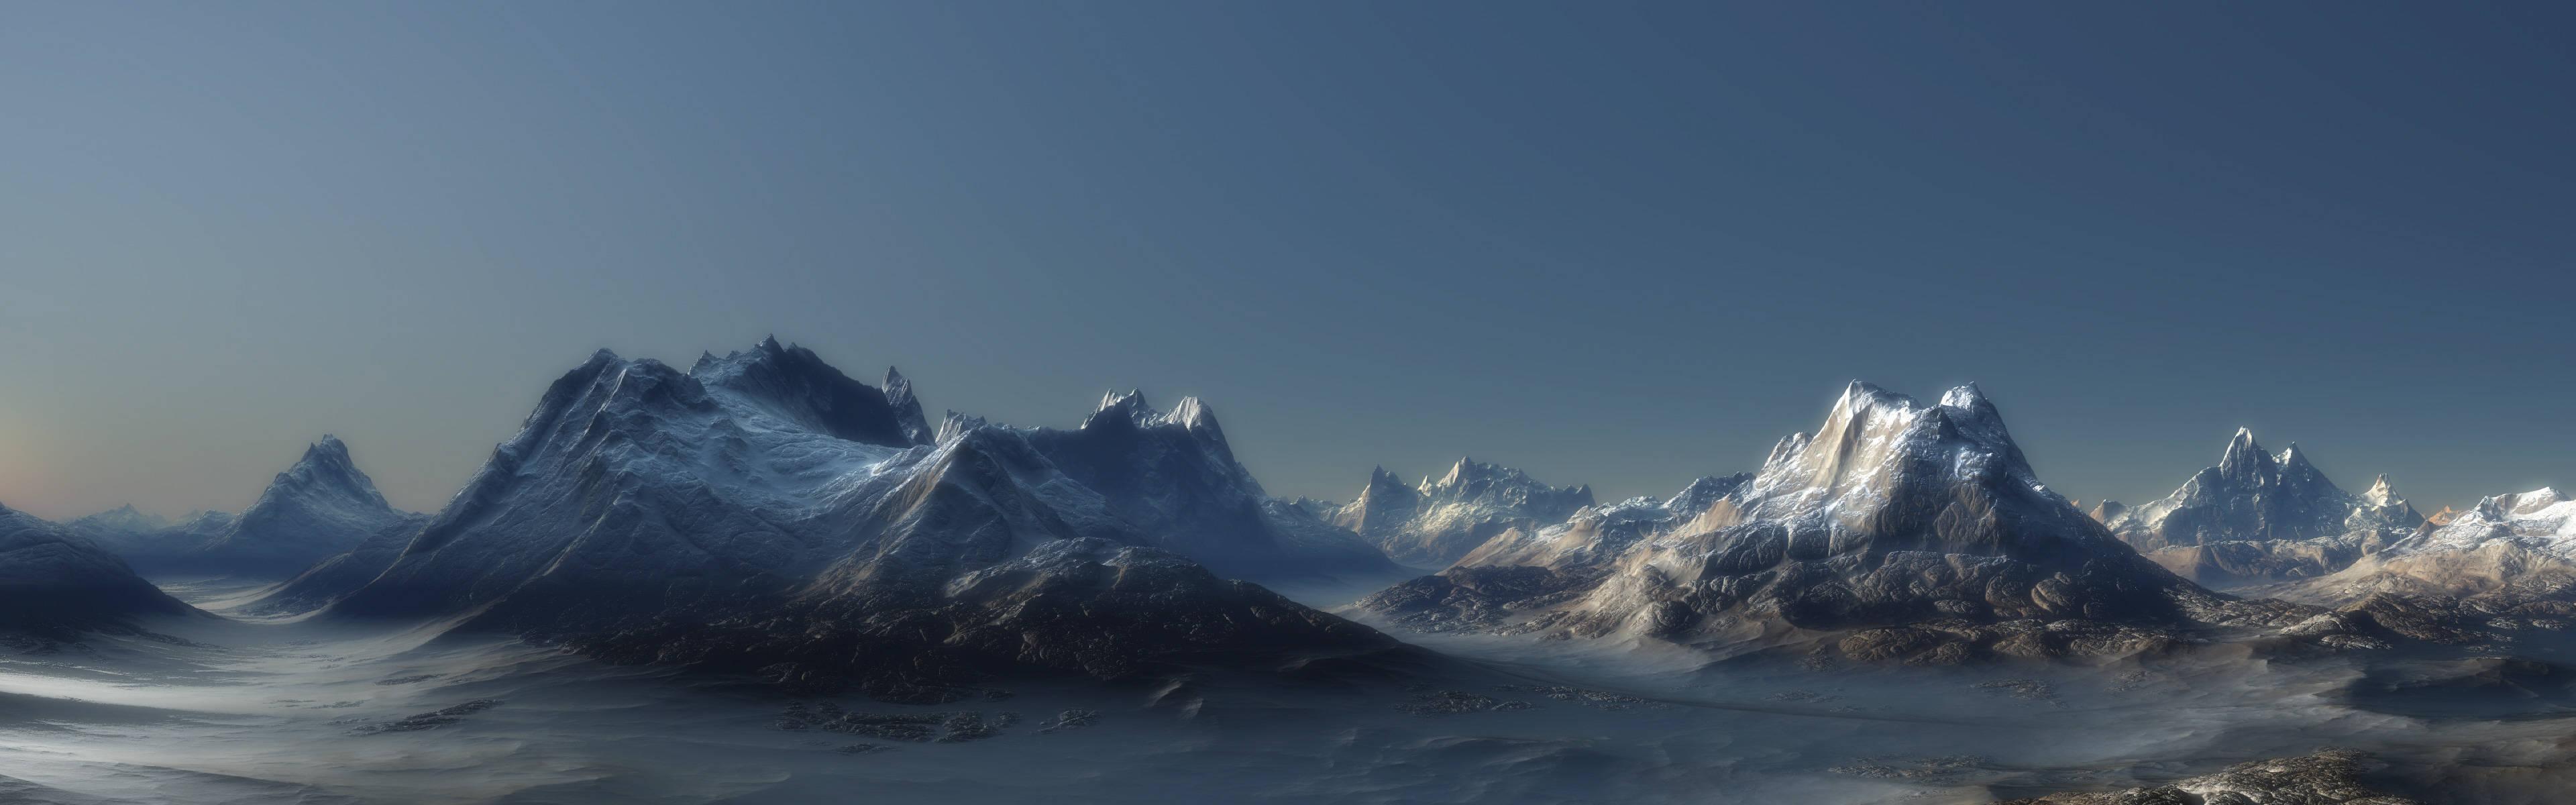 Mountains Landscapes 38401200 Wallpaper 793715 3840x1200